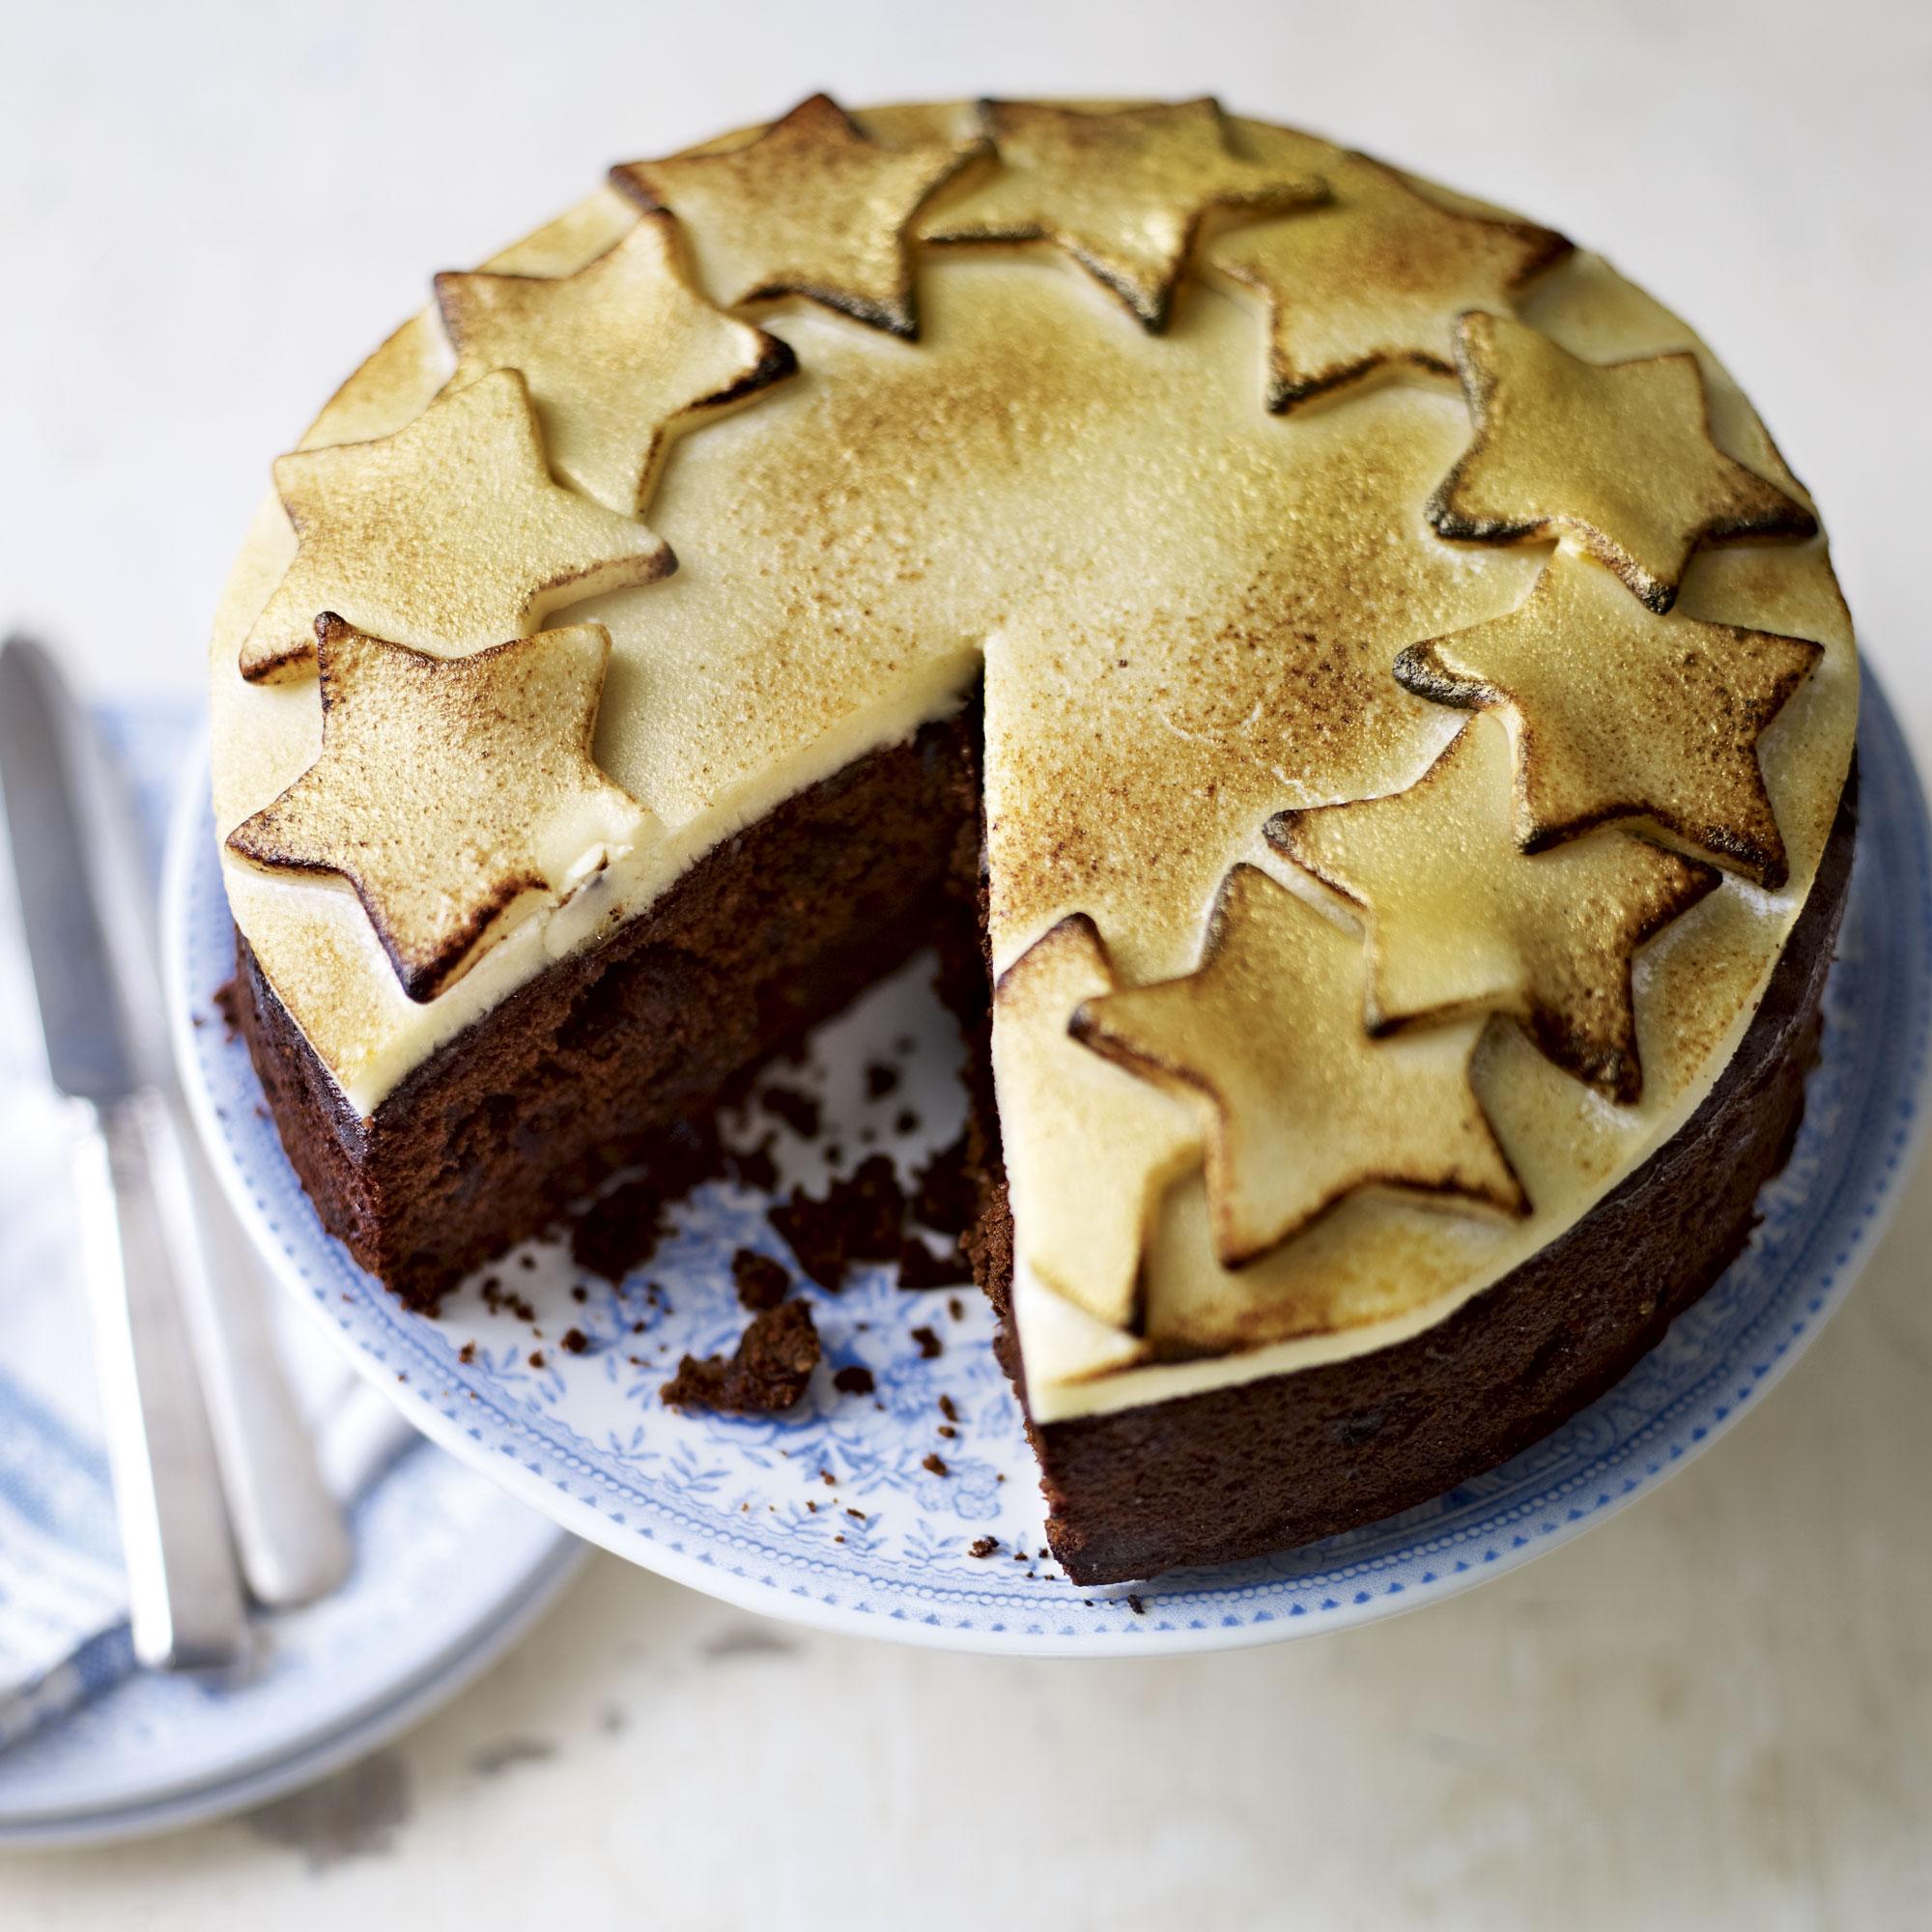 Holiday Chocolate Cake Recipes